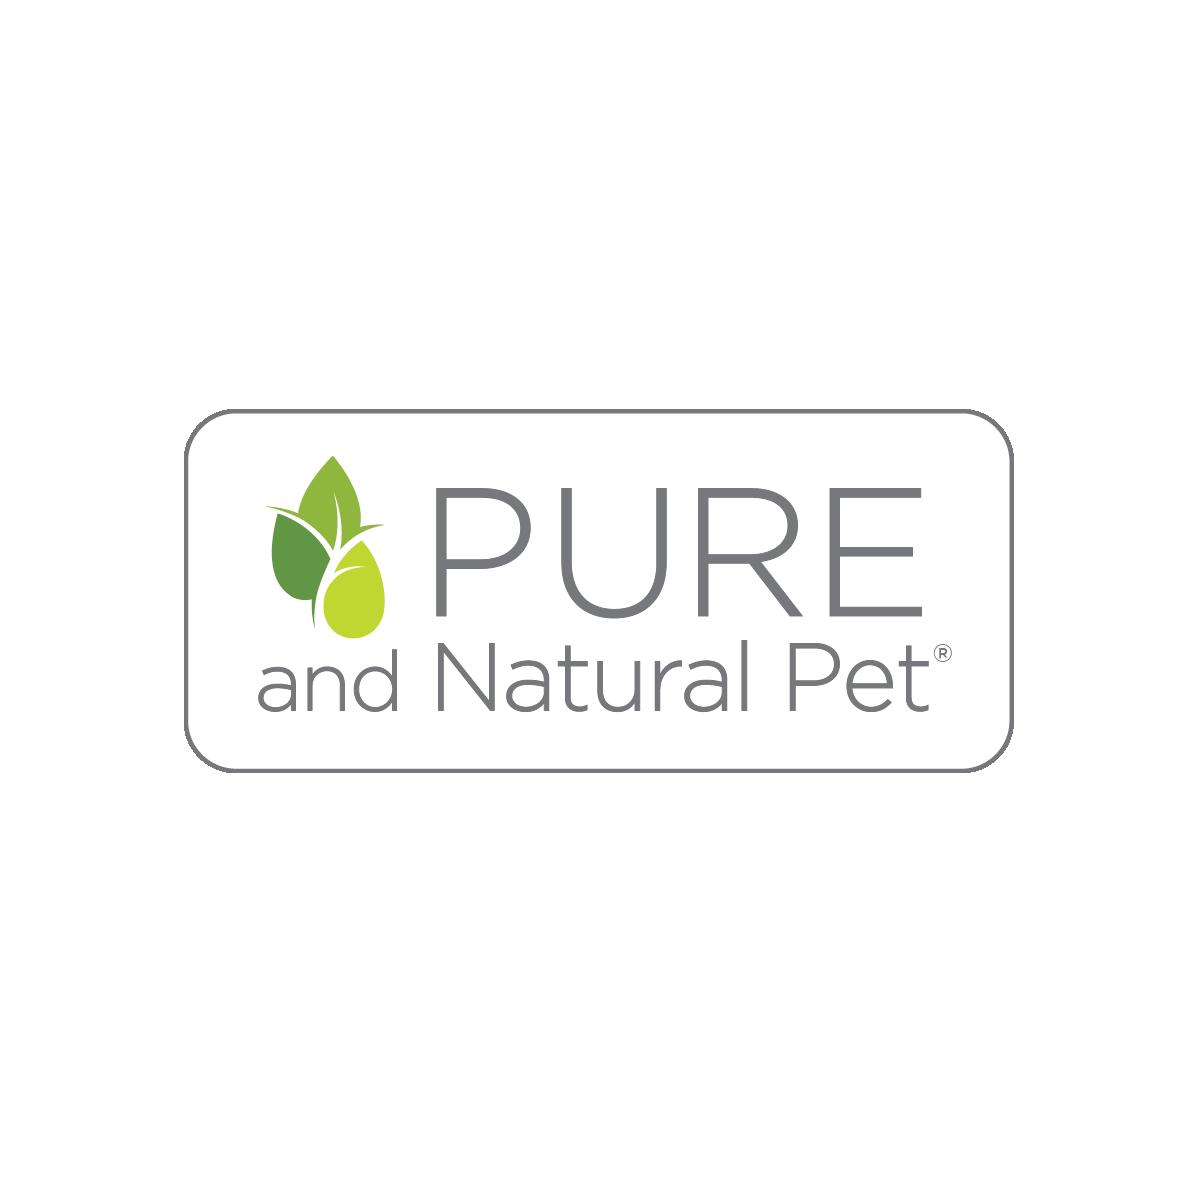 Pure and Natural Pet® Logo Image